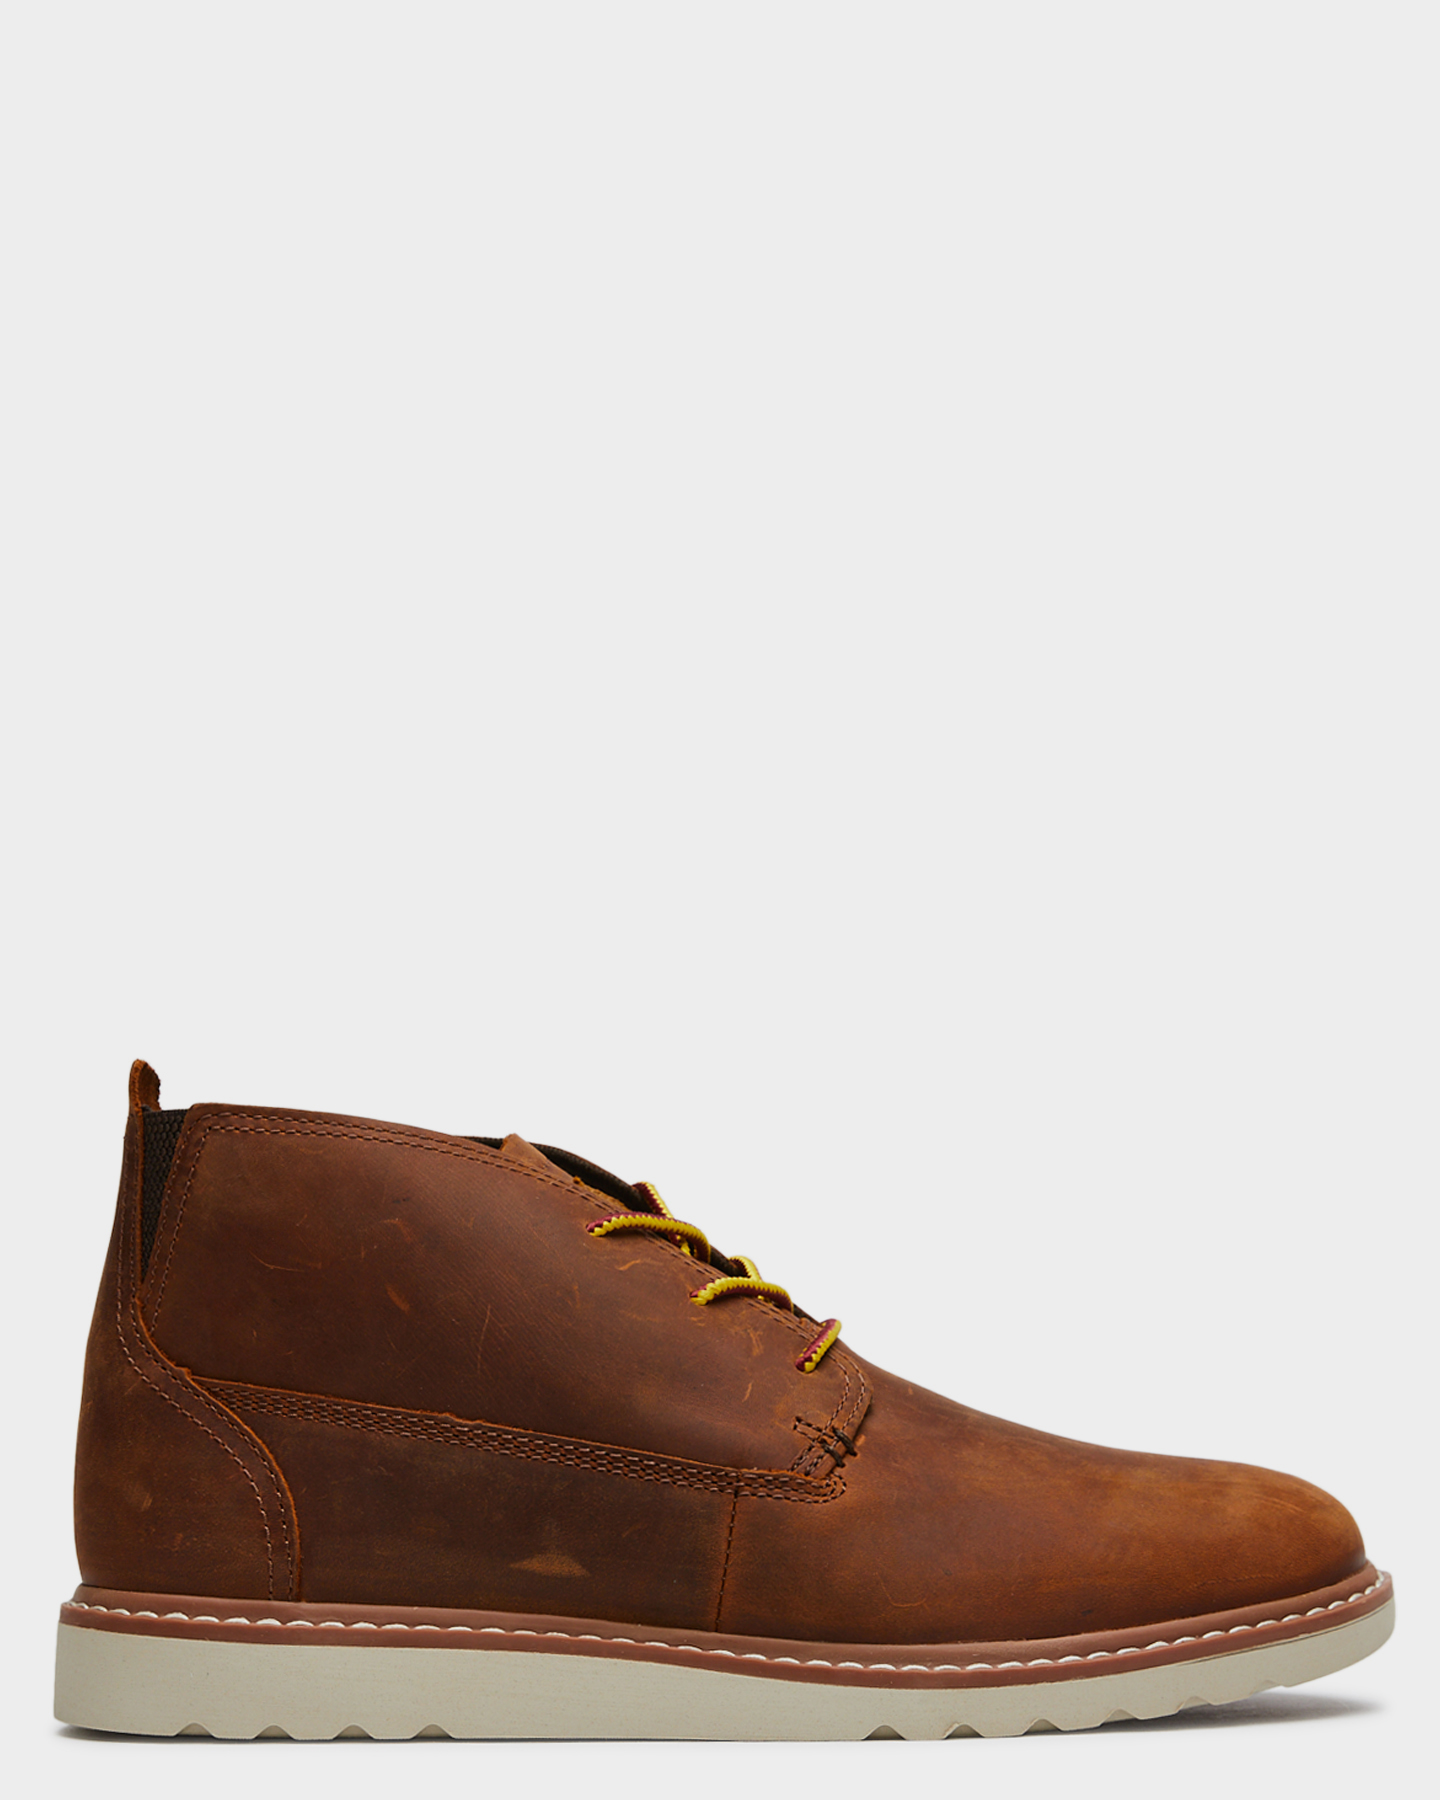 Reef Mens Voyage Leather Boot Brown